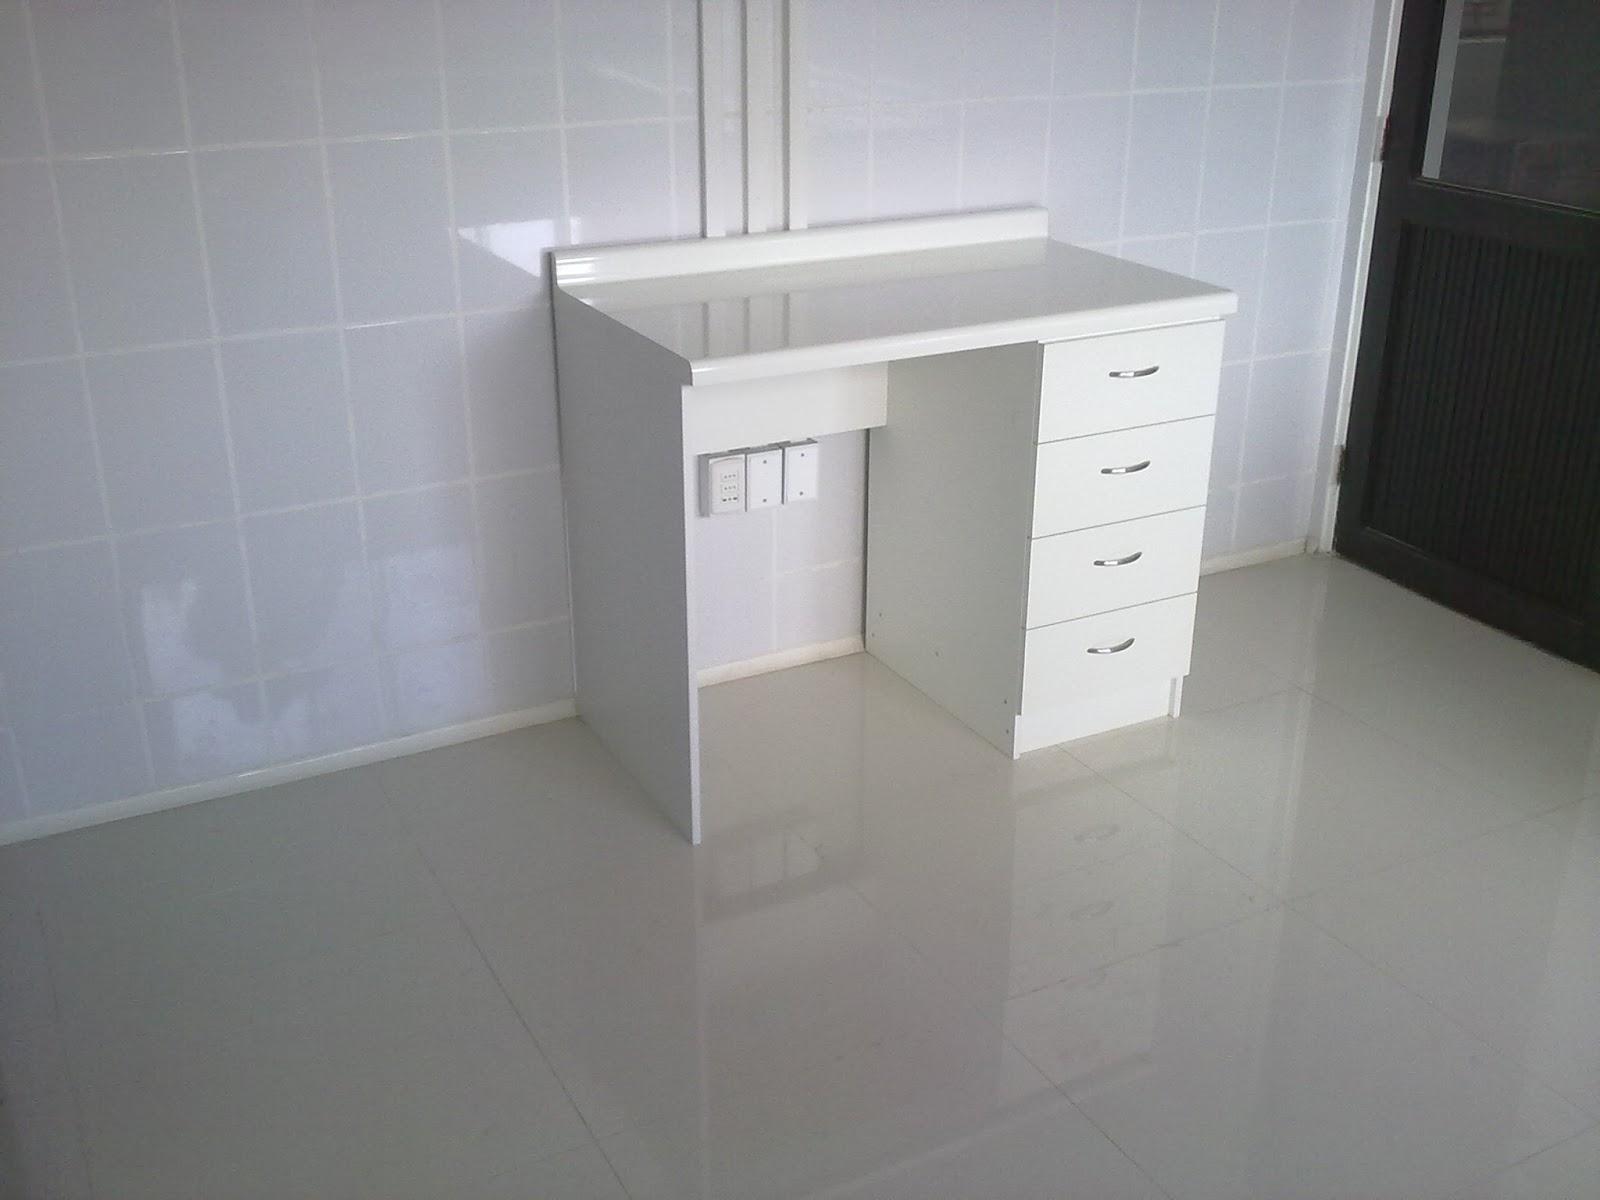 imagenes de muebles de oficina - Arquitectura E Imagen Muebles para Oficina Bogota